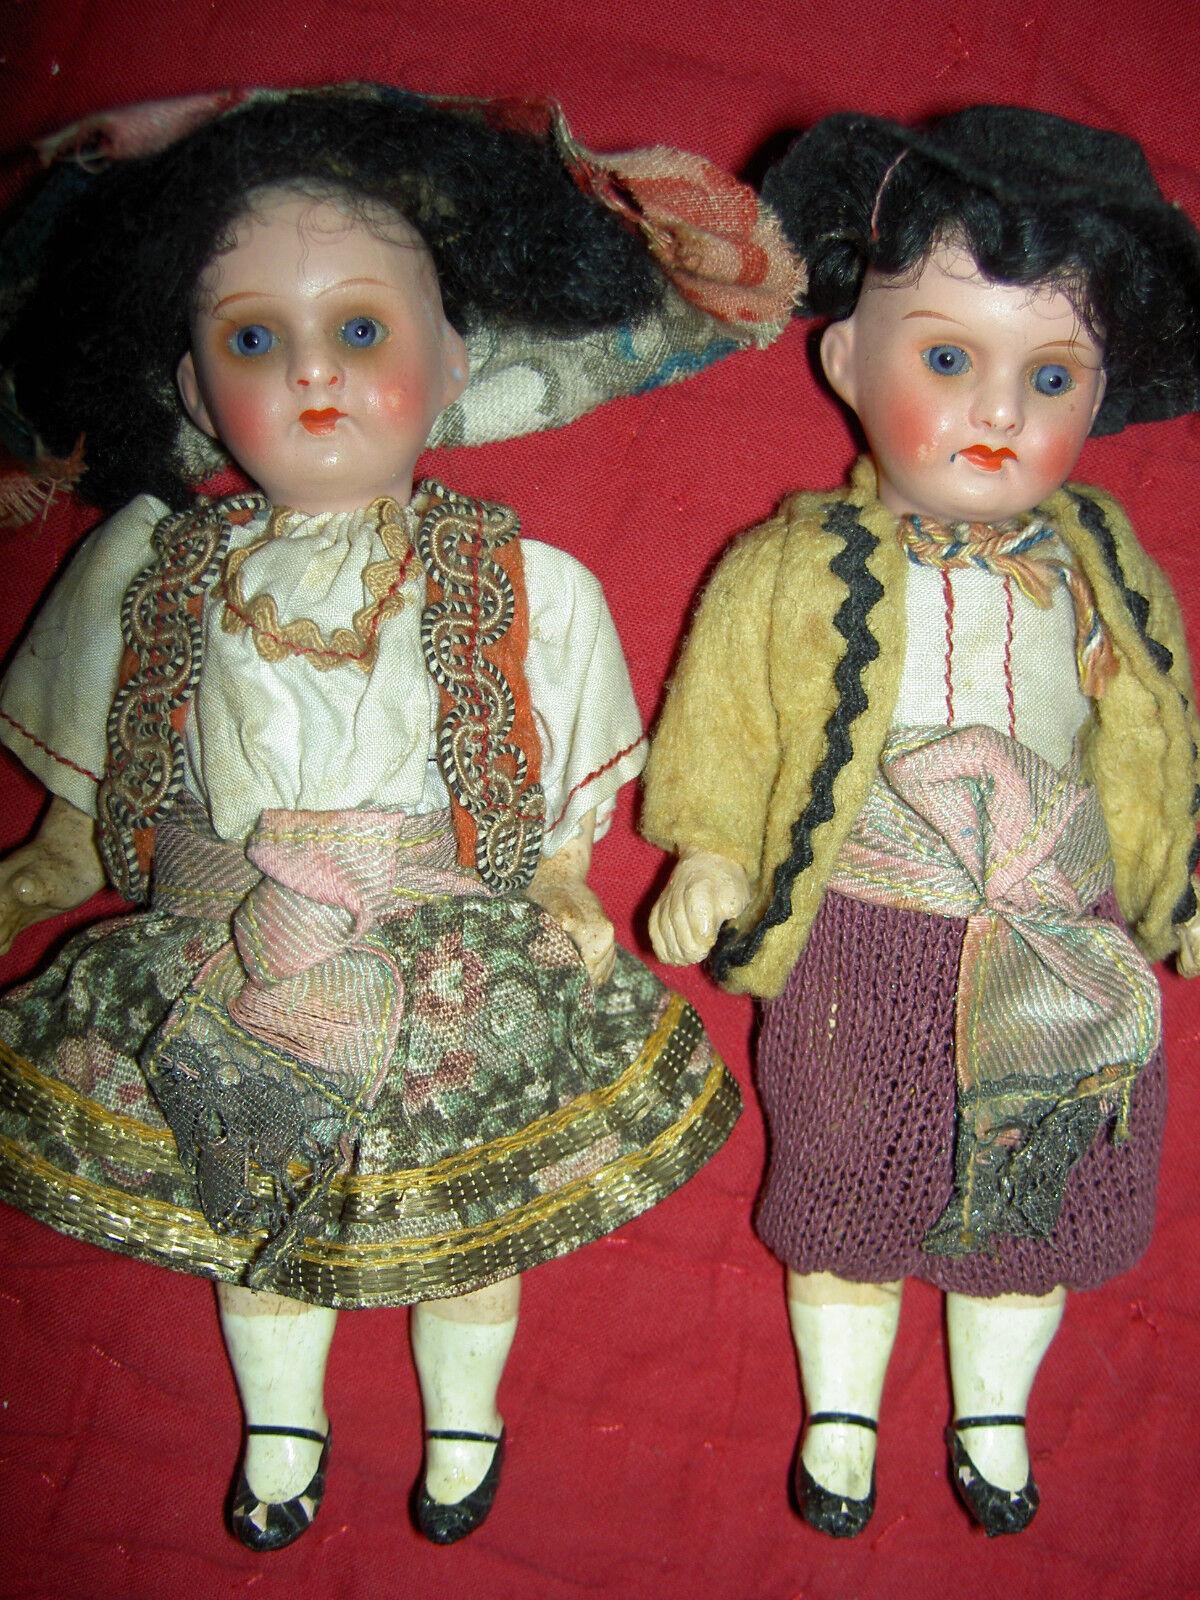 Adorable Par, articulado muñecas antiguas bisque 1920s alemán, trajes Original XLNT